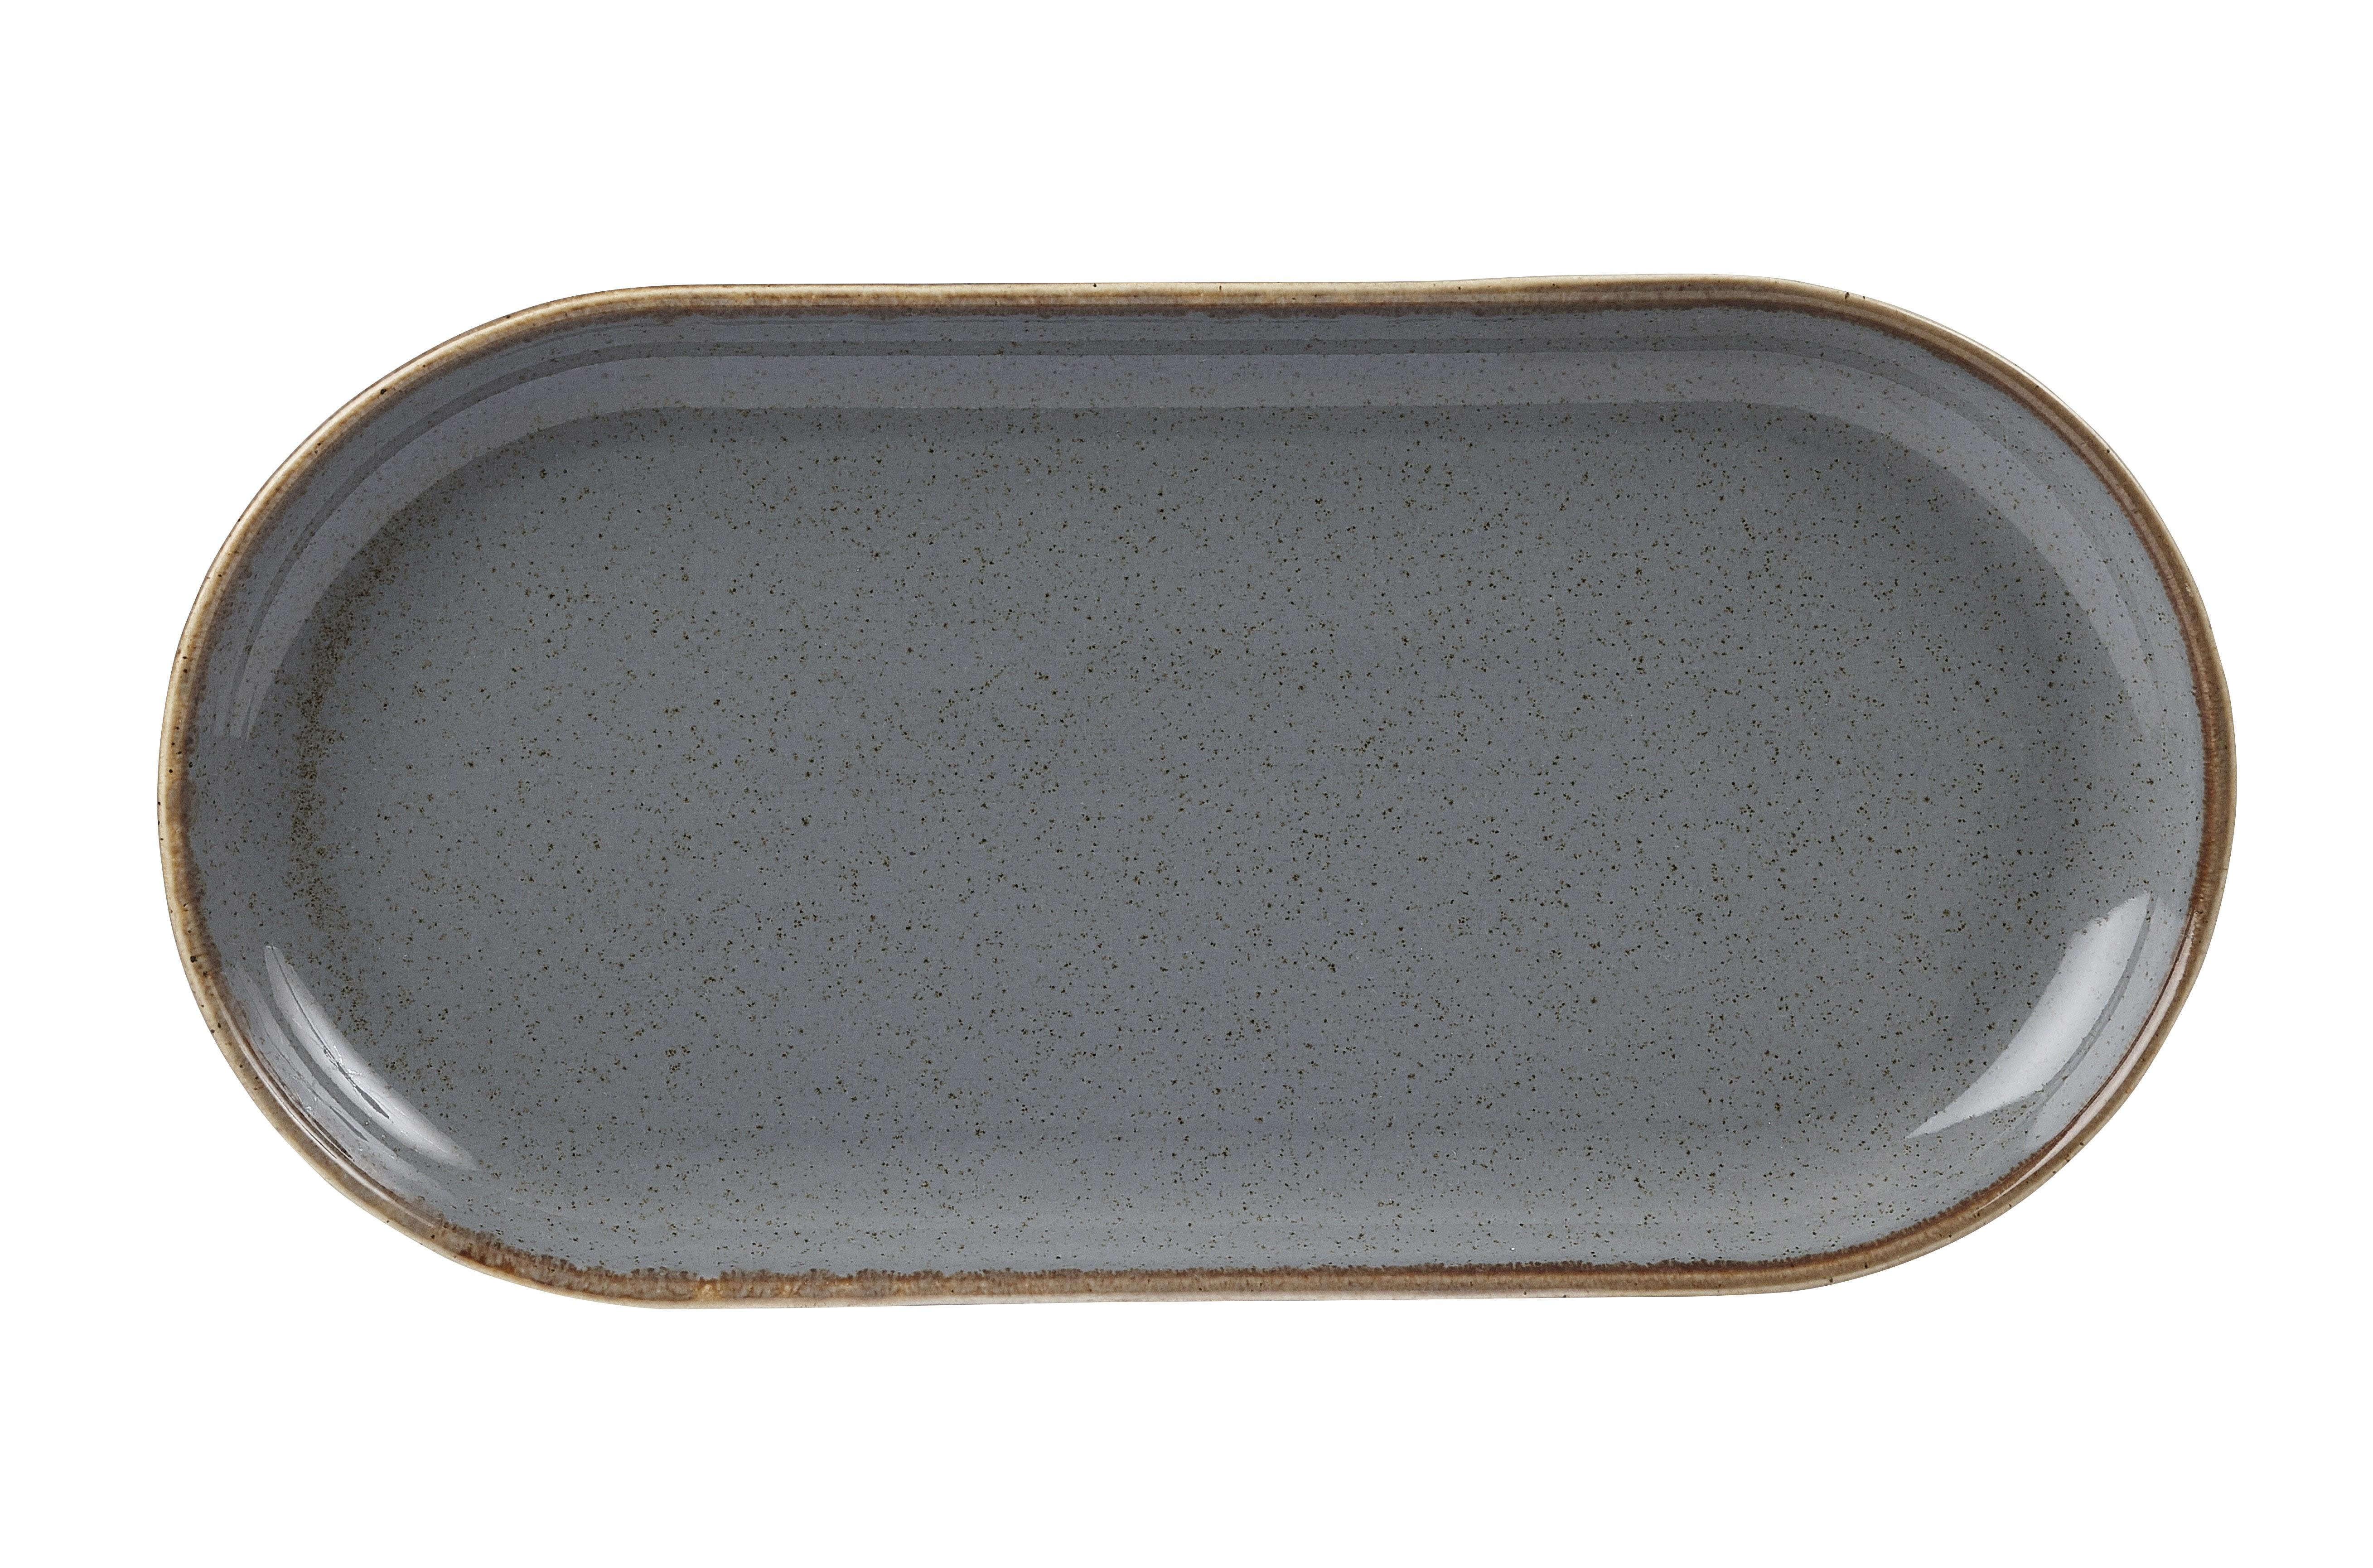 "Irrumpir en estrecha oval Placa 32x20cm / 12.5x8"""